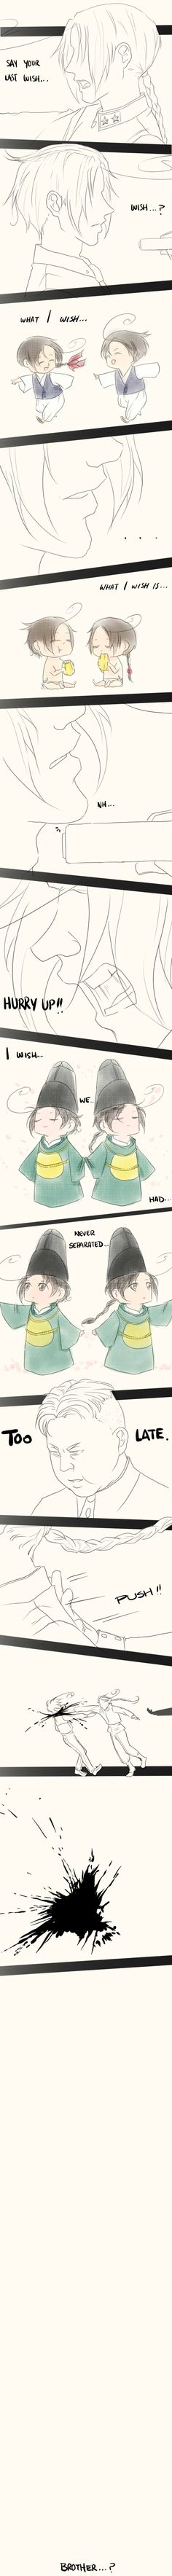 [Korea] Brother by vorabend-taboo.deviantart.com on @deviantART Talk about heartbreaking